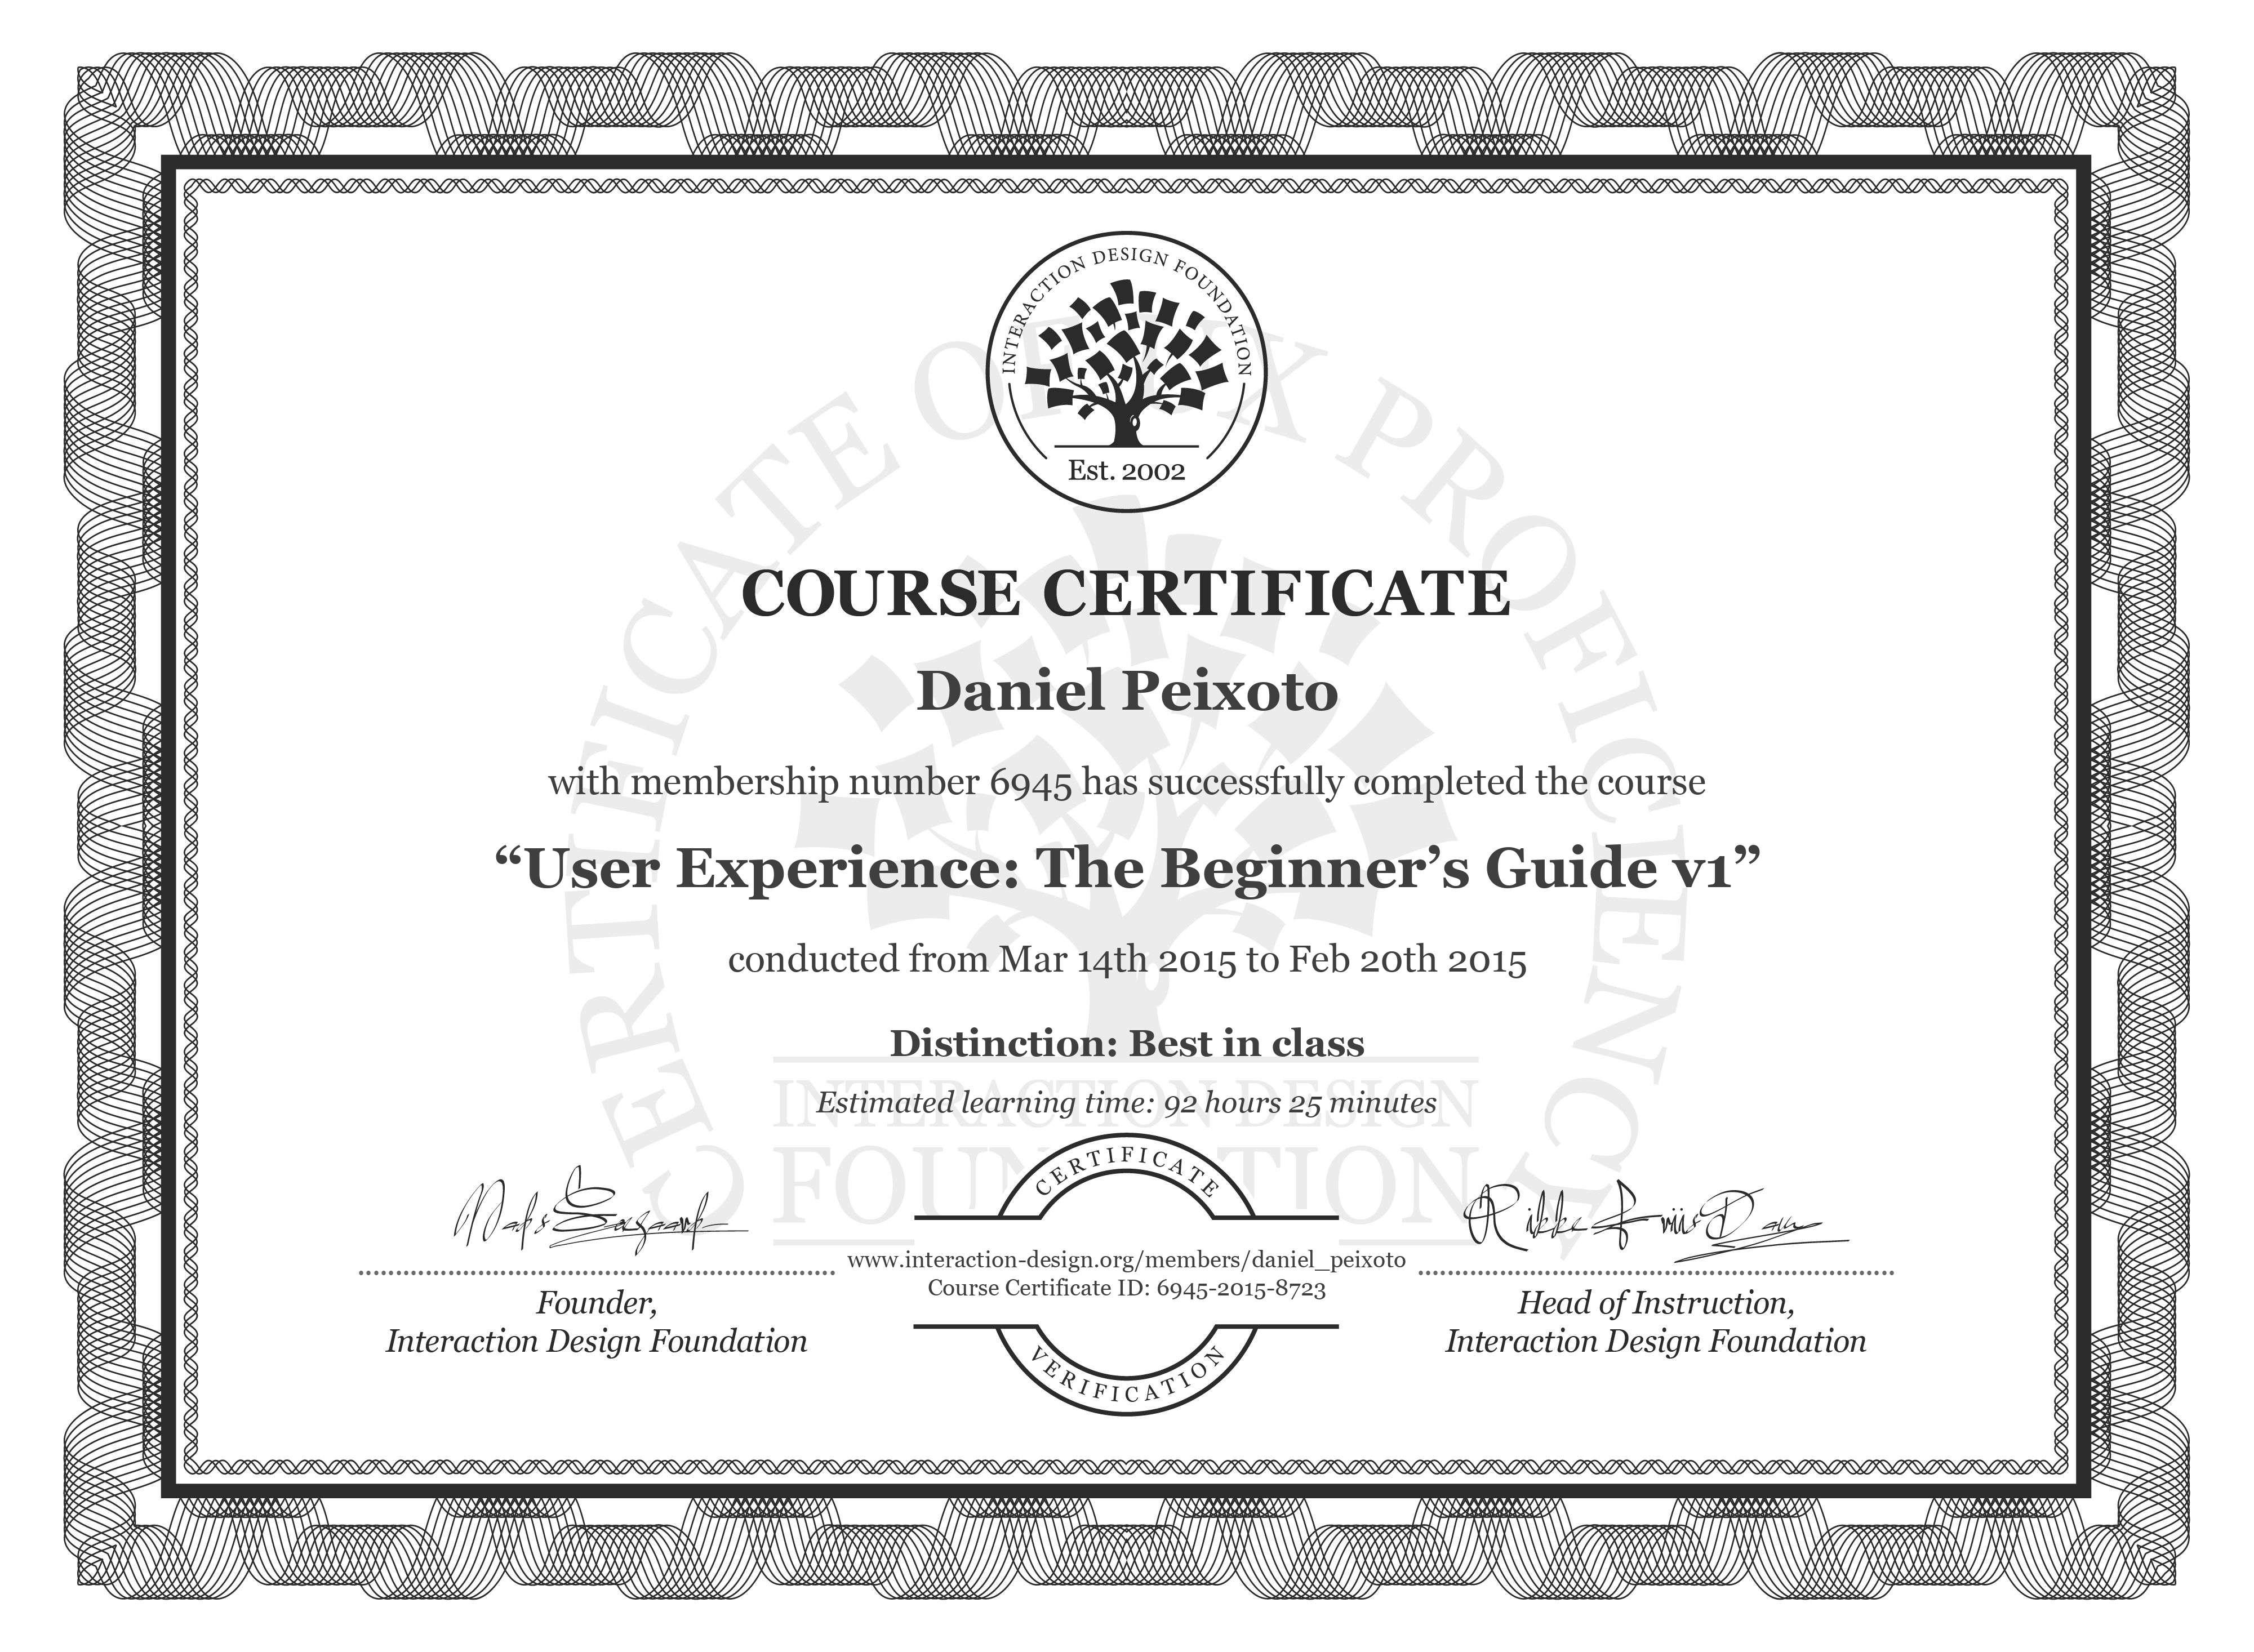 Daniel Peixoto's Course Certificate: User Experience: The Beginner's Guide